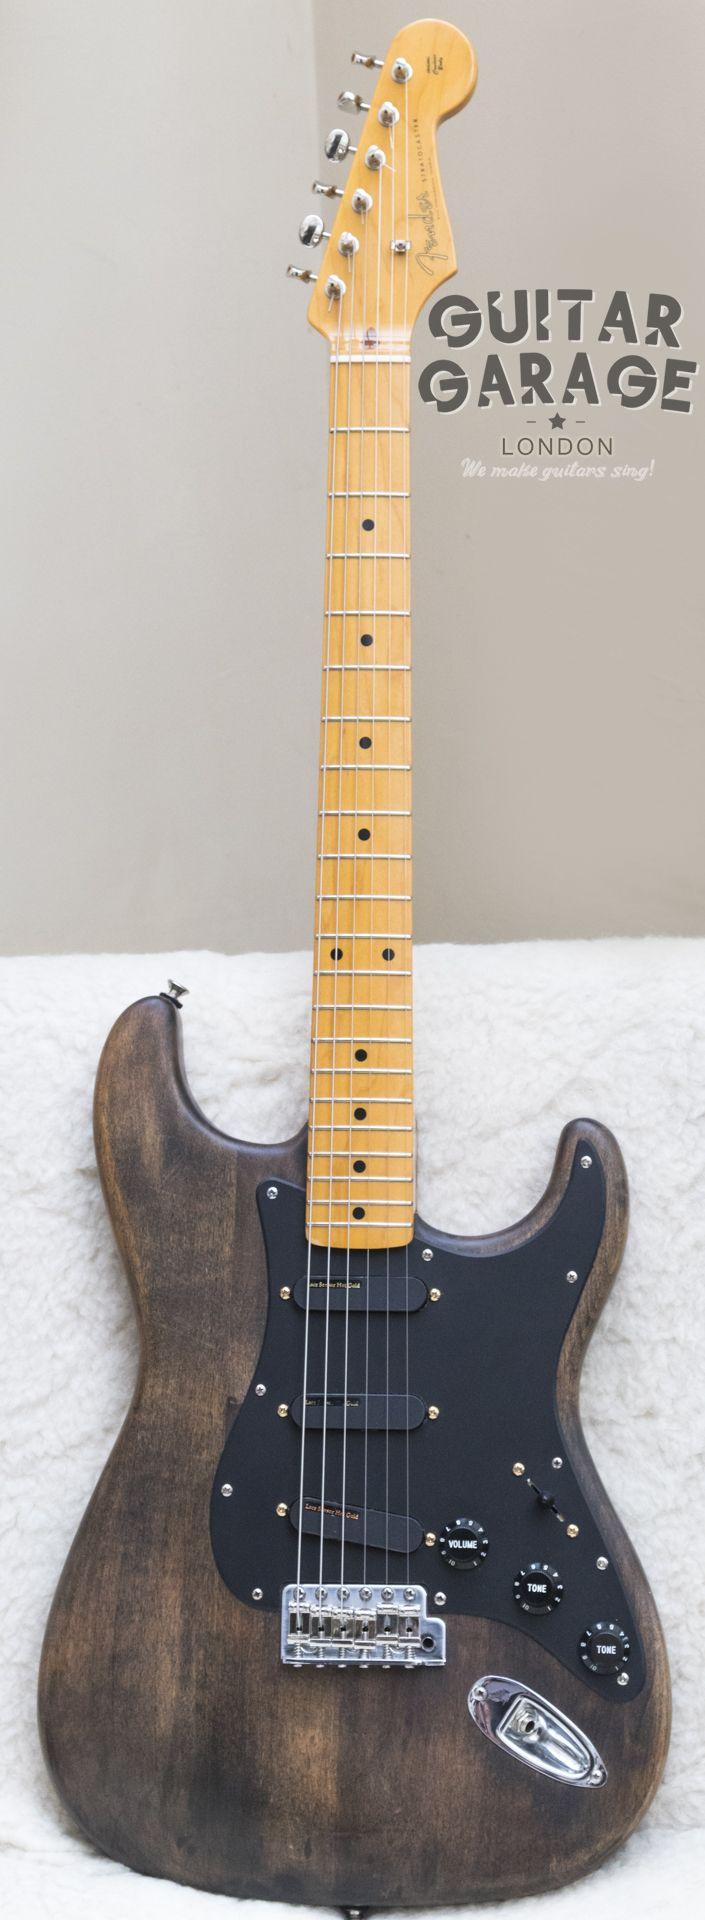 2002 Fender Japan '57 Vintage Reissue Stratocaster with Lace Sensors Hot Gold pickup set